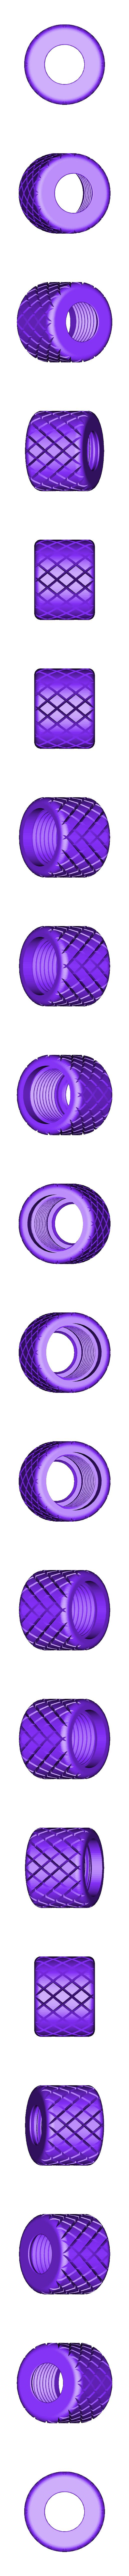 verrou jeu -05 par face.stl Download STL file Articulated support camera , photo , video , creality ender 3 standard screws photo • 3D printable template, benj2365